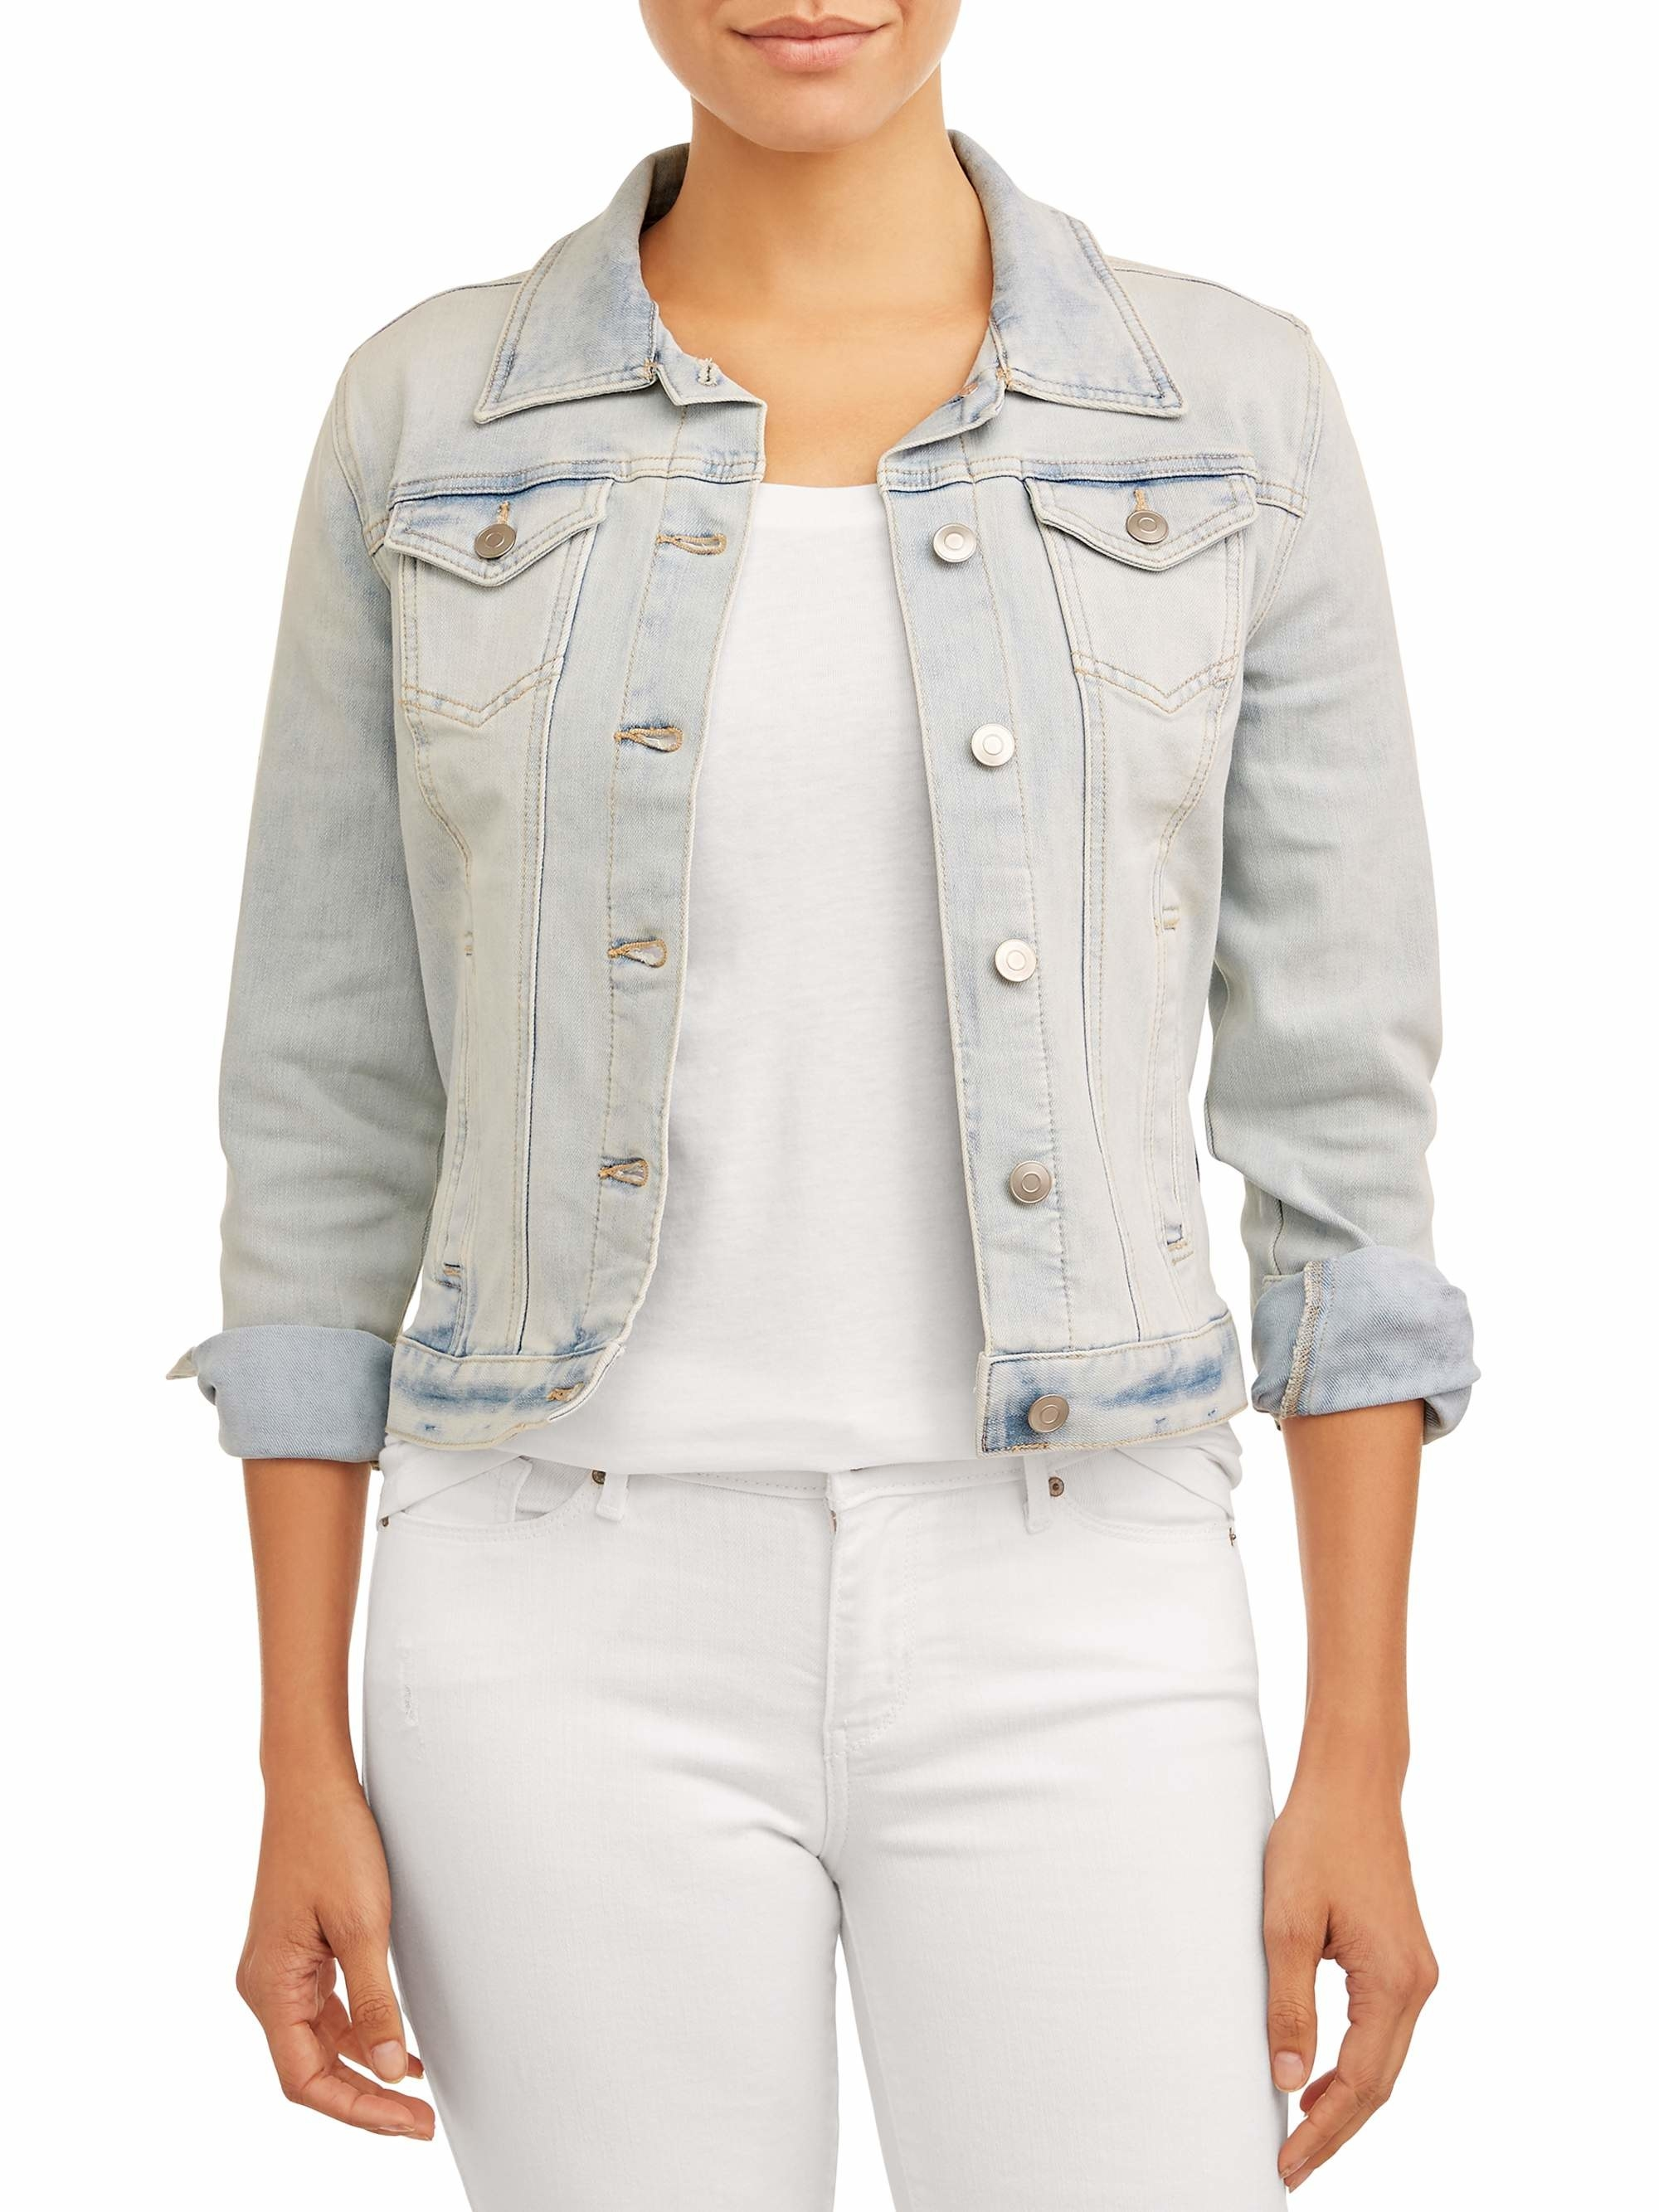 Model wearing the light wash jacket